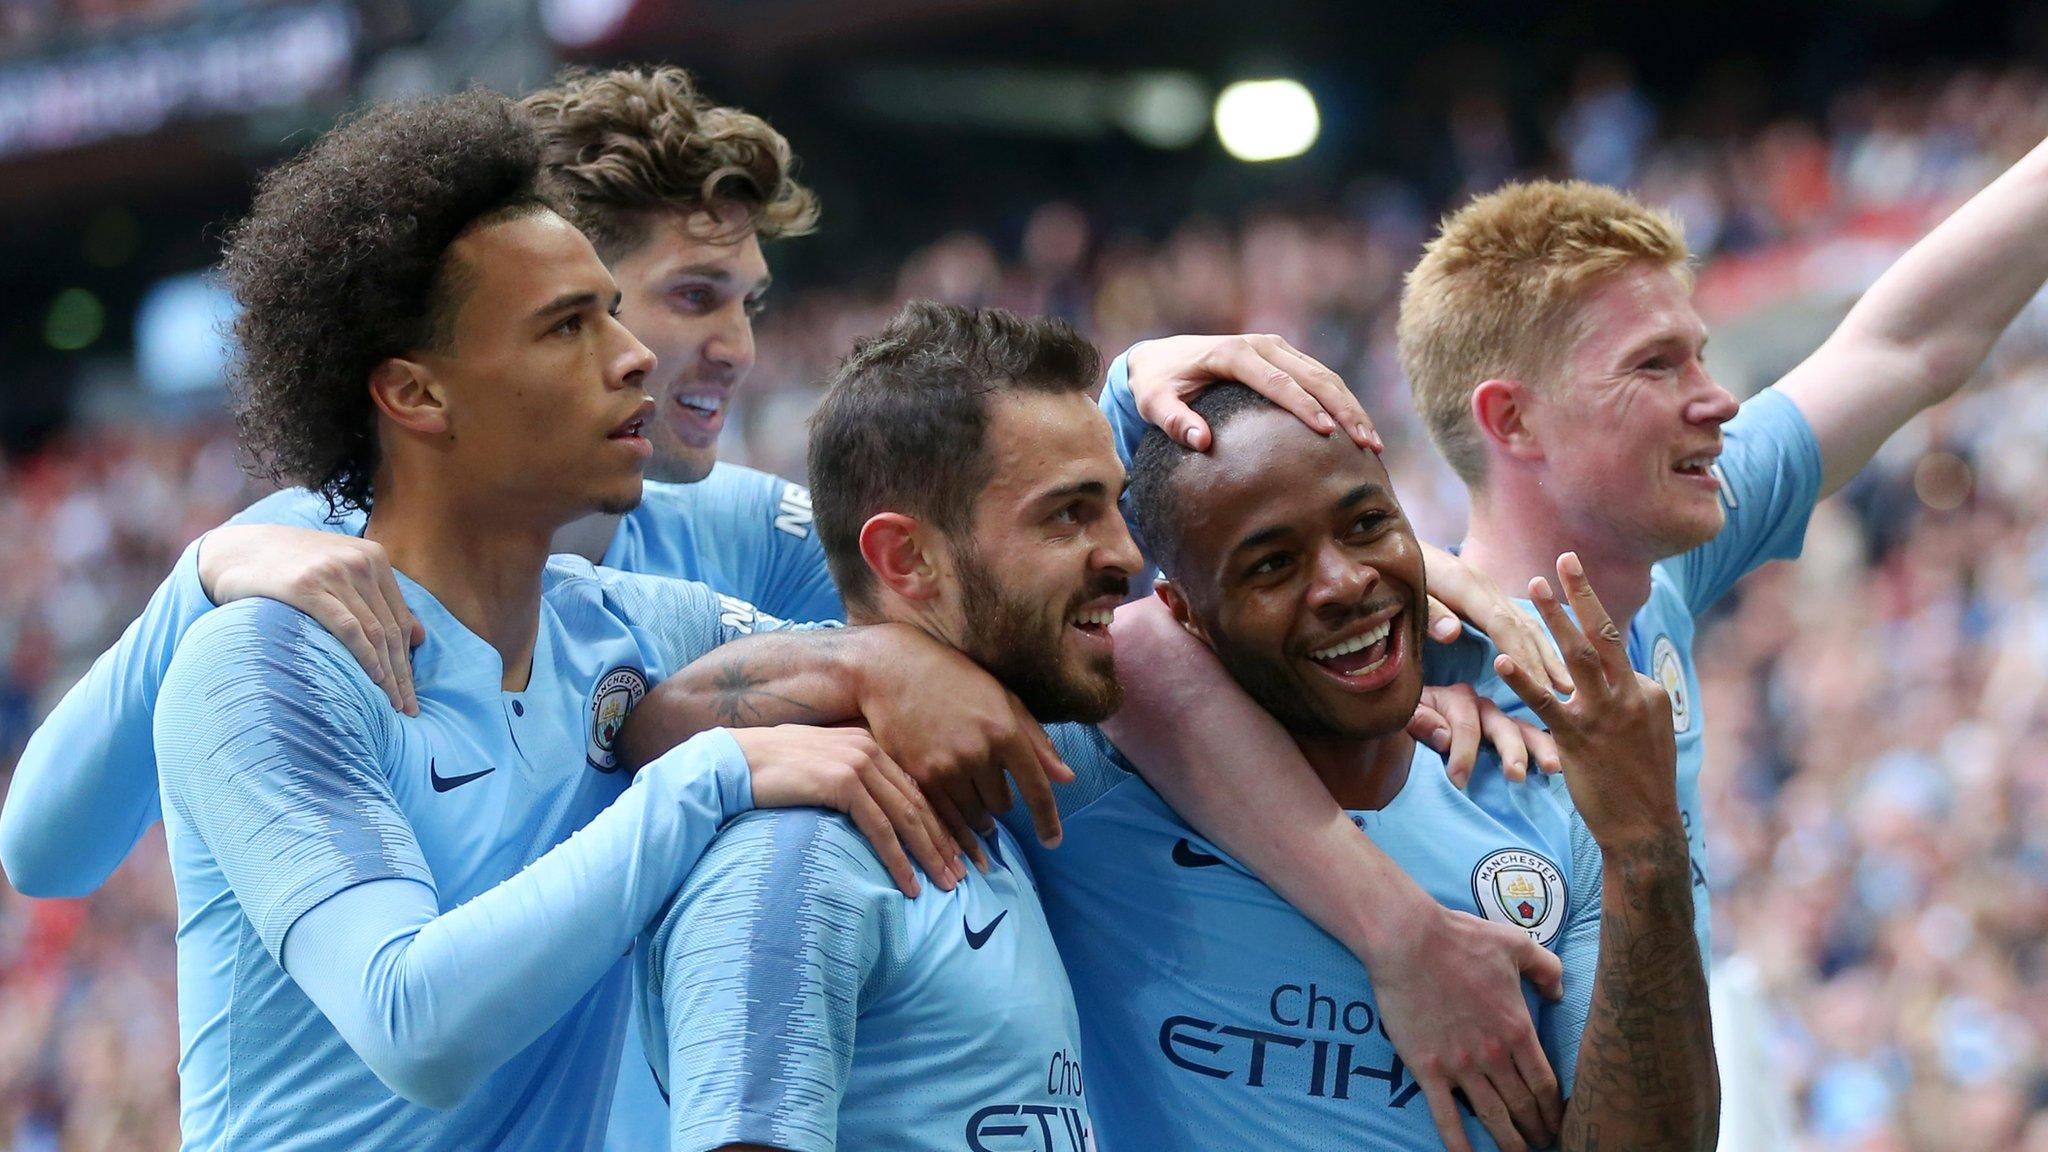 Man City win treble - how impressive is that achievement?